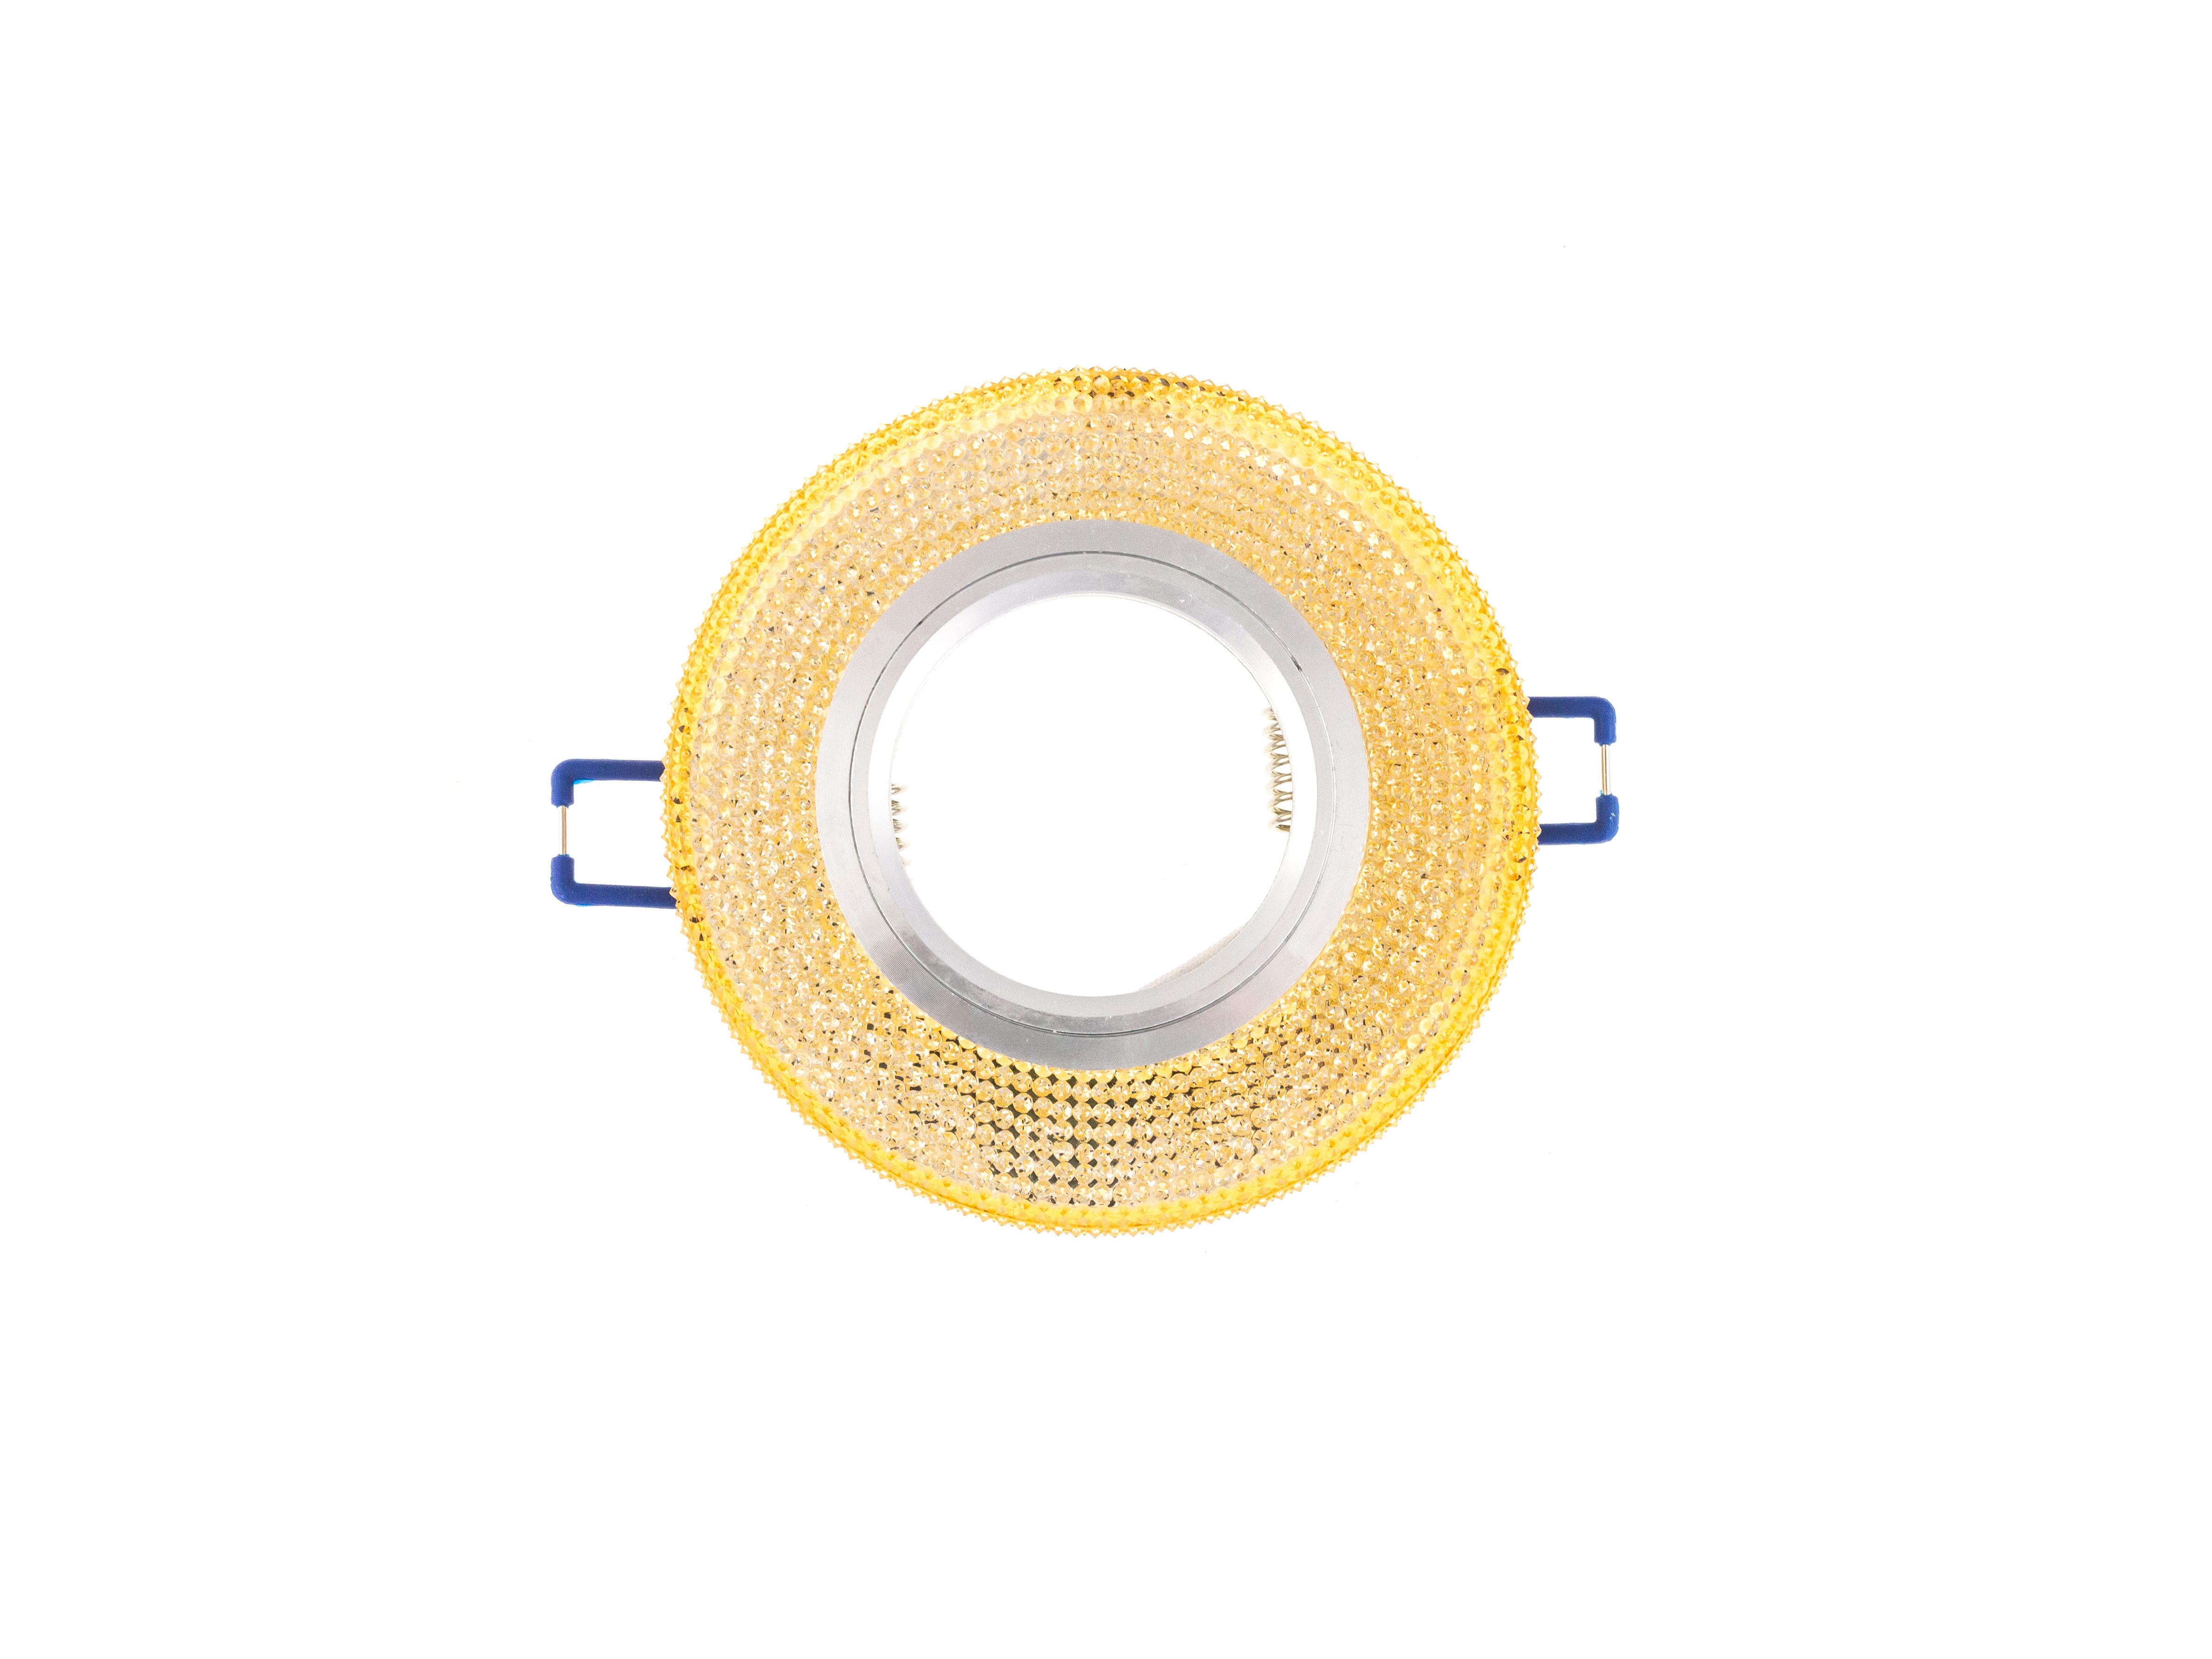 Встраиваемый светильник Lumin'arte PL10-DLL50GU.53-3W, серебристый mr16 3w 3 led red light bulb 12v